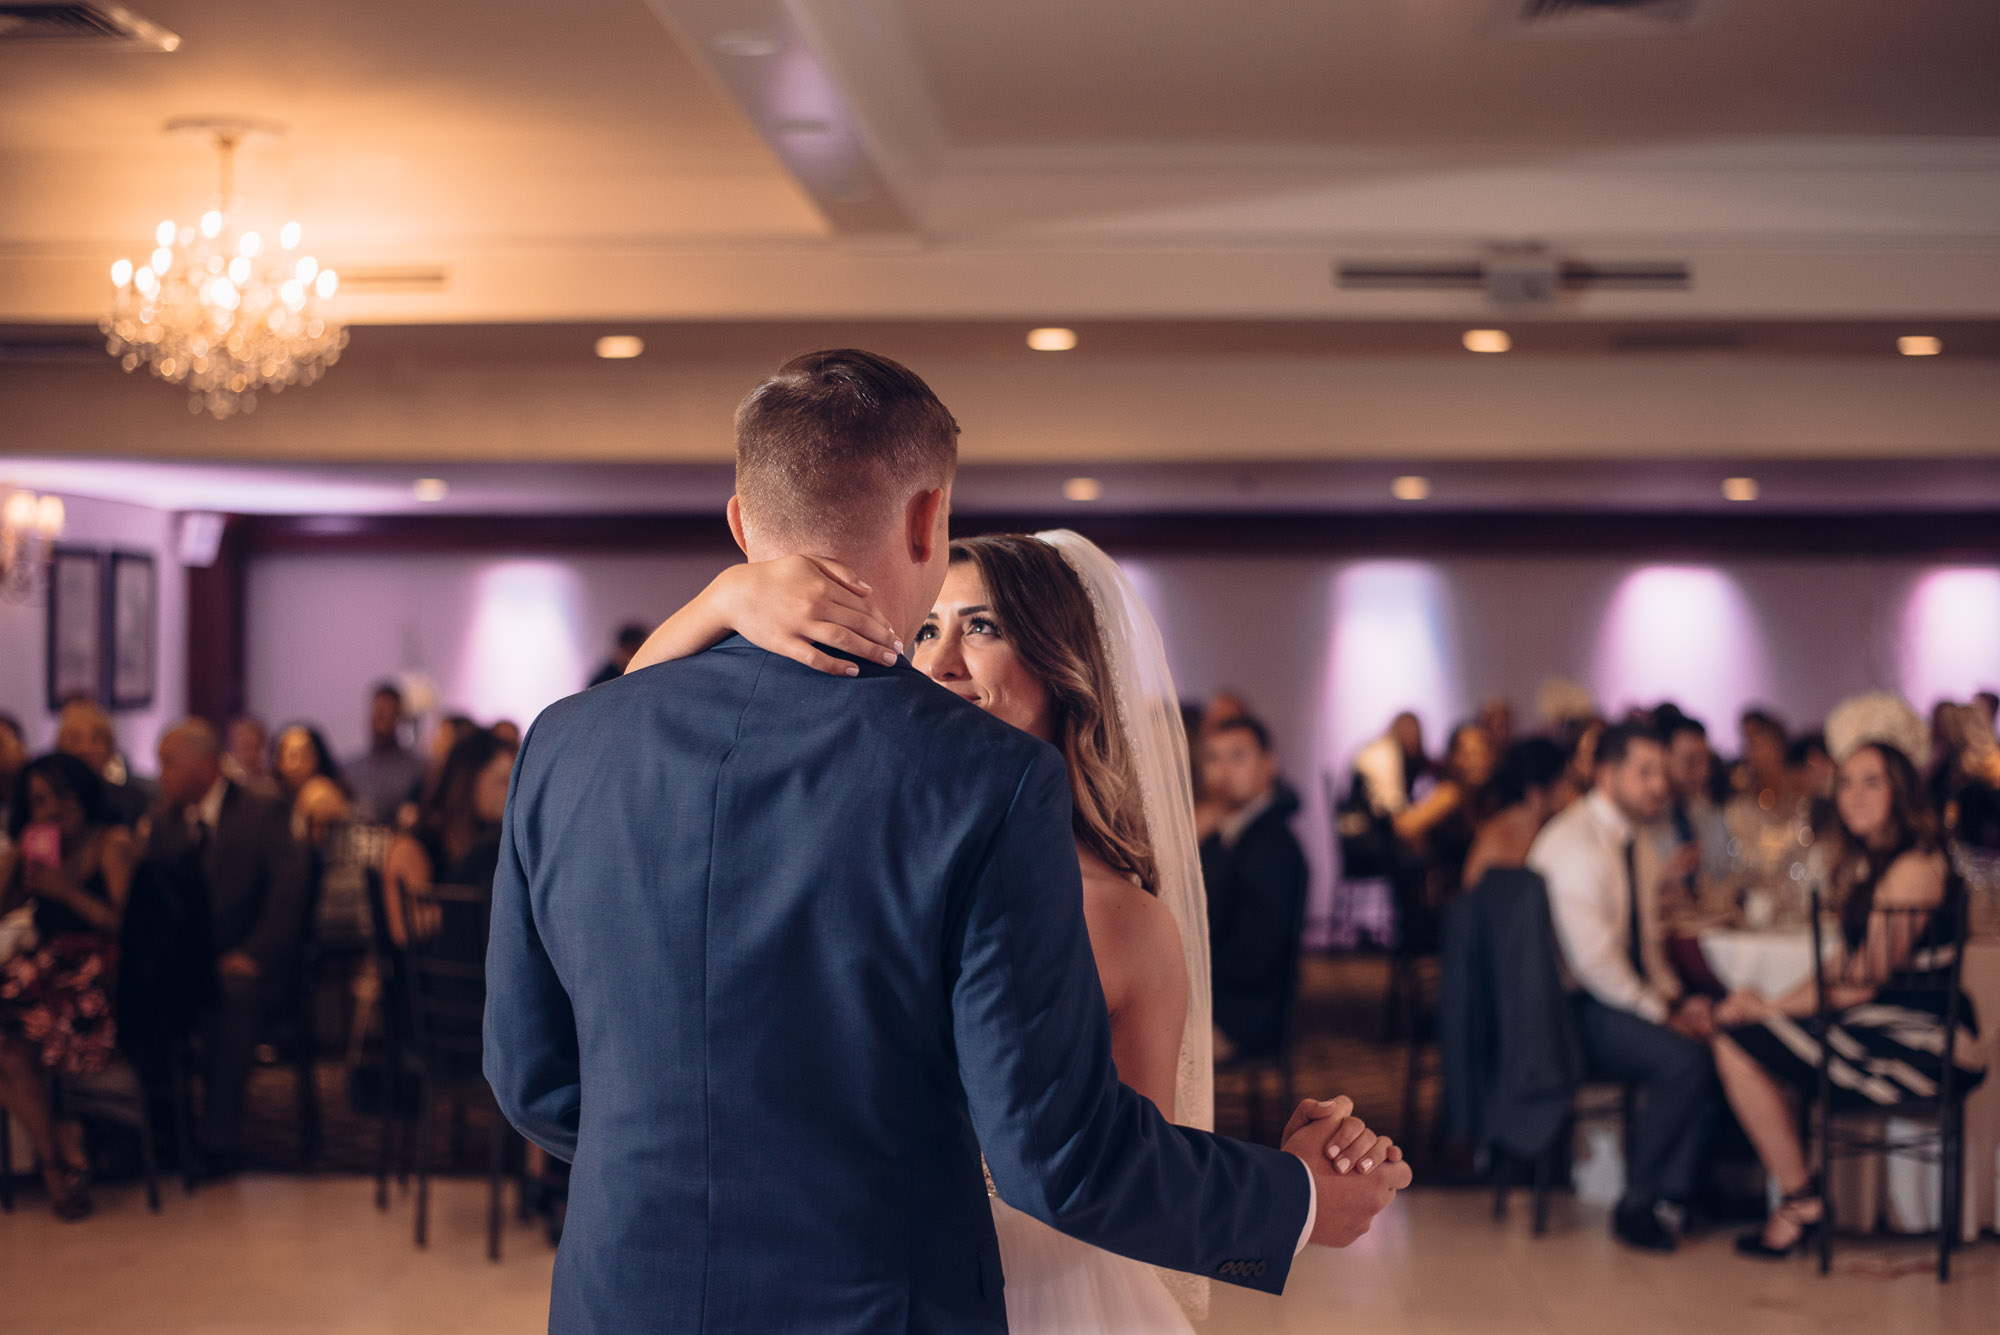 woodwinds_wedding_171020_web-47.jpg